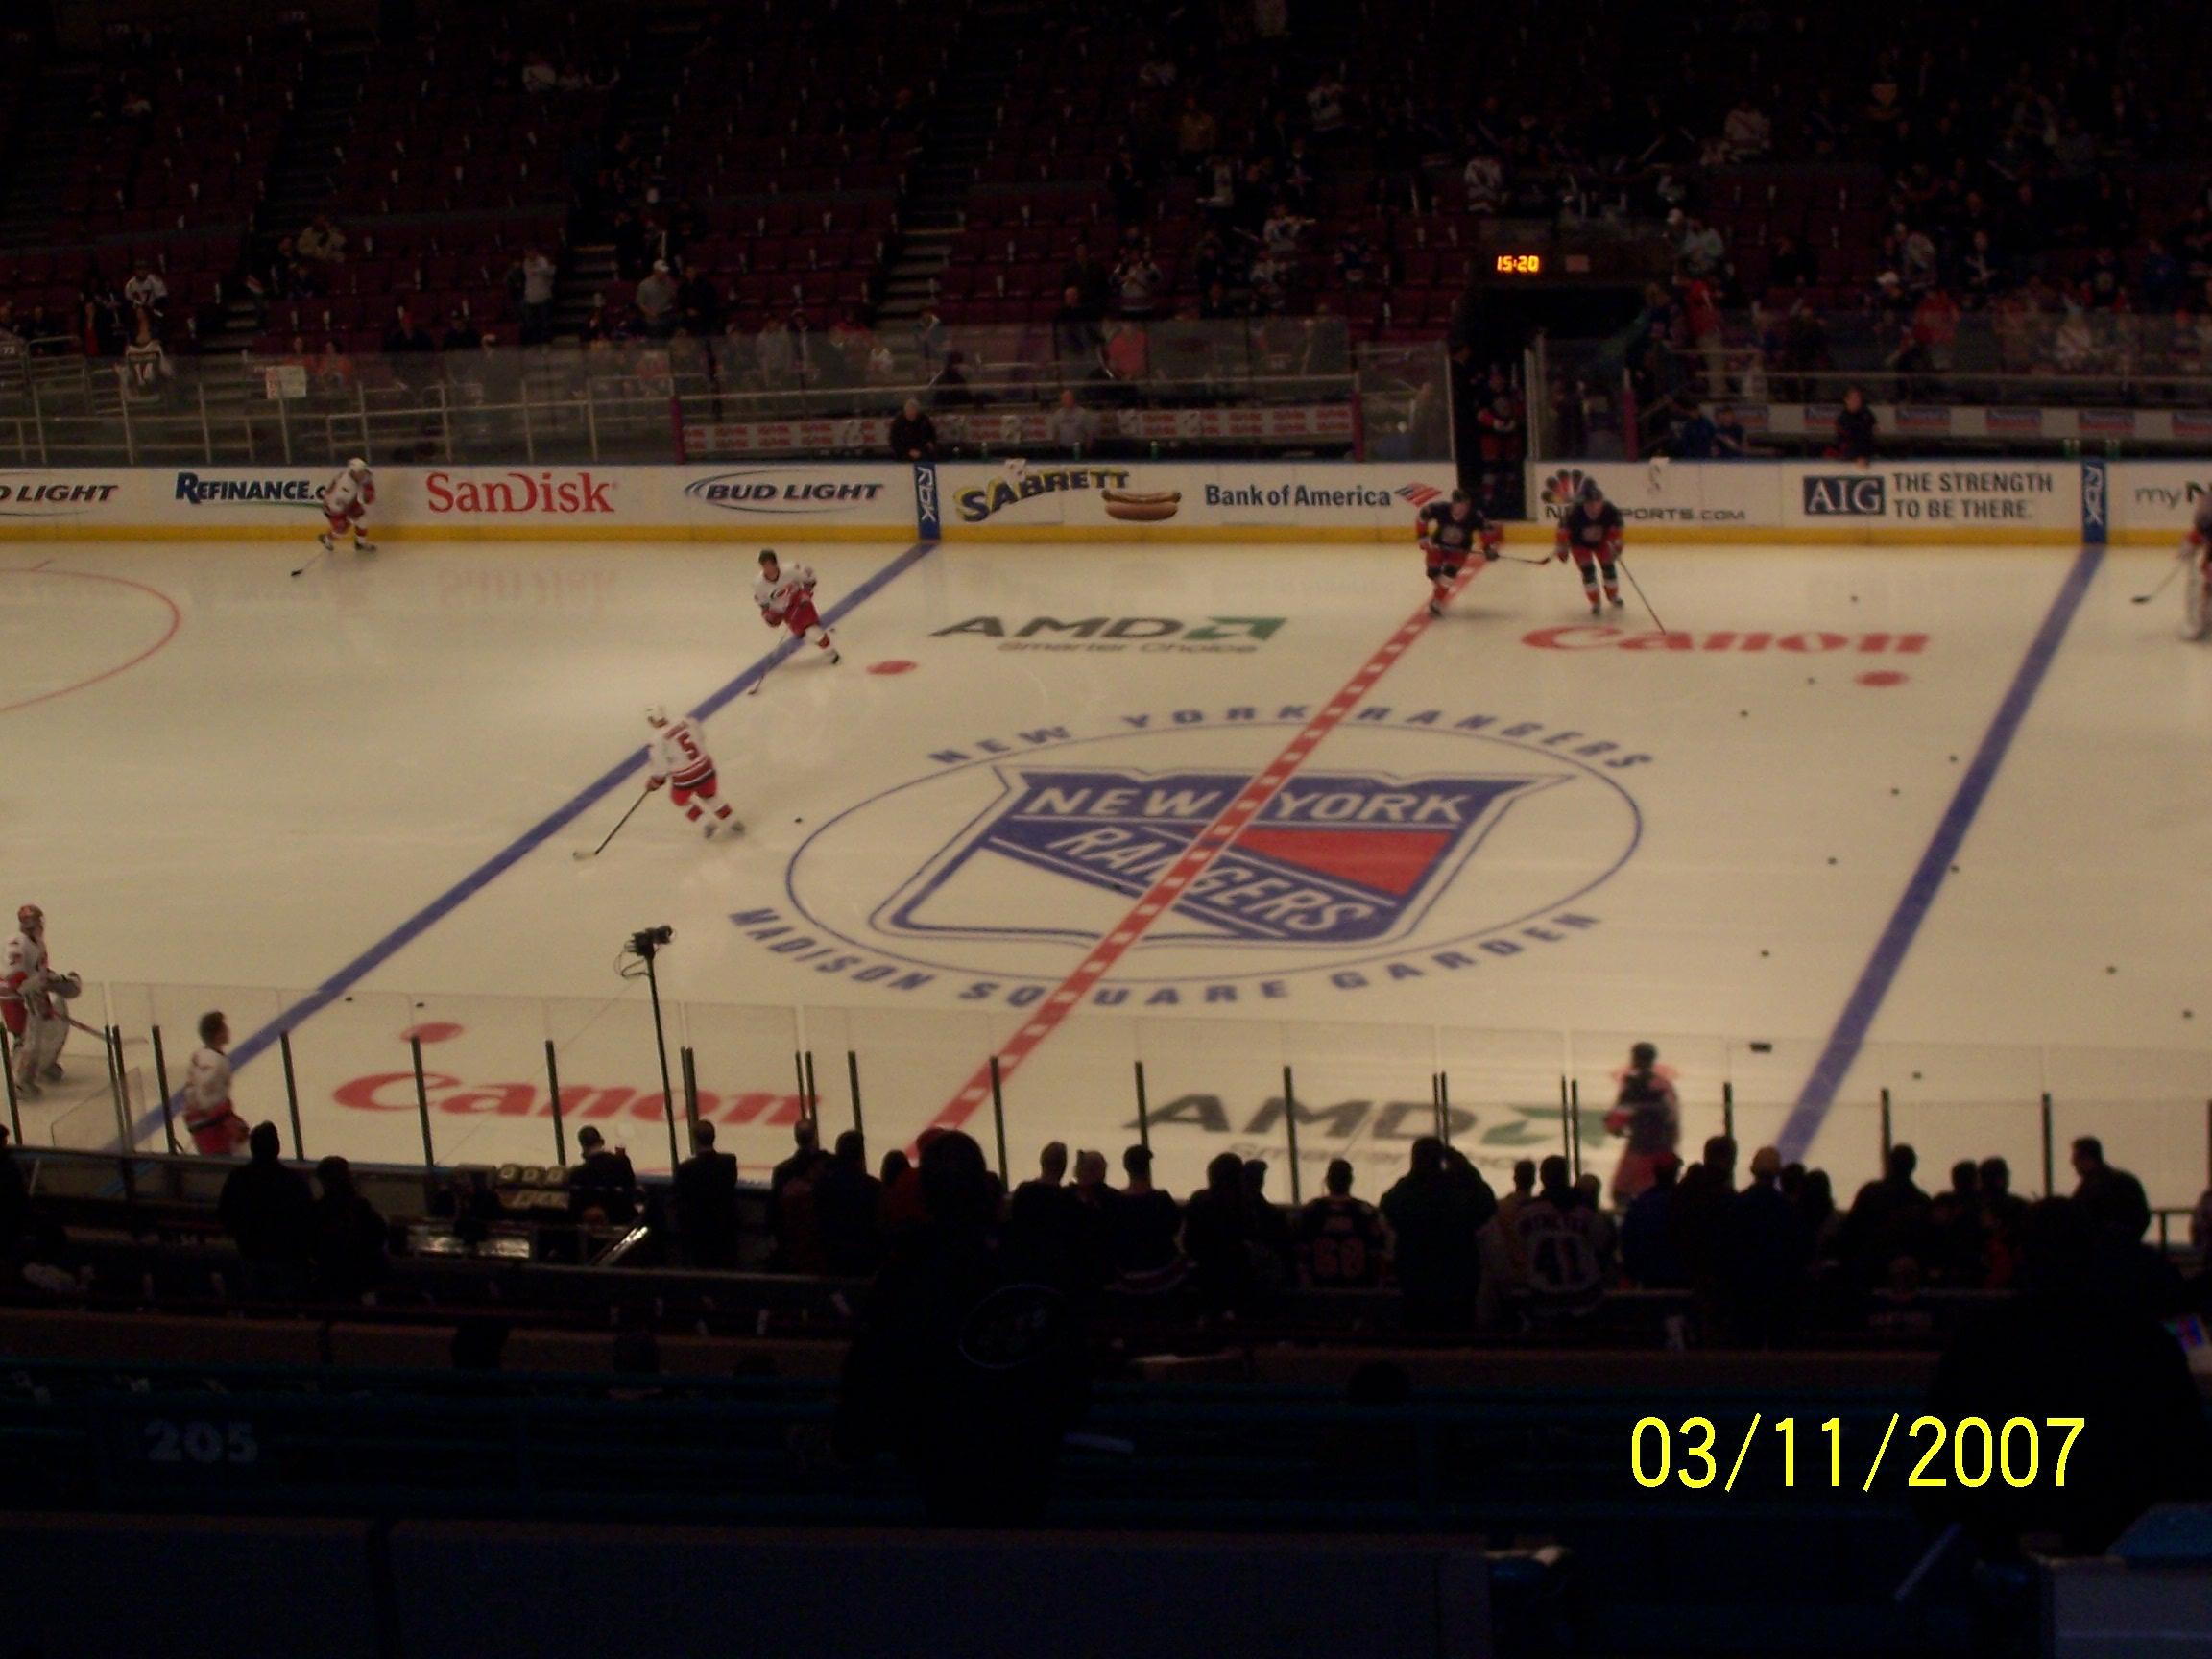 File:EM Madison Square Garden (2247217817).jpg - Wikimedia Commons